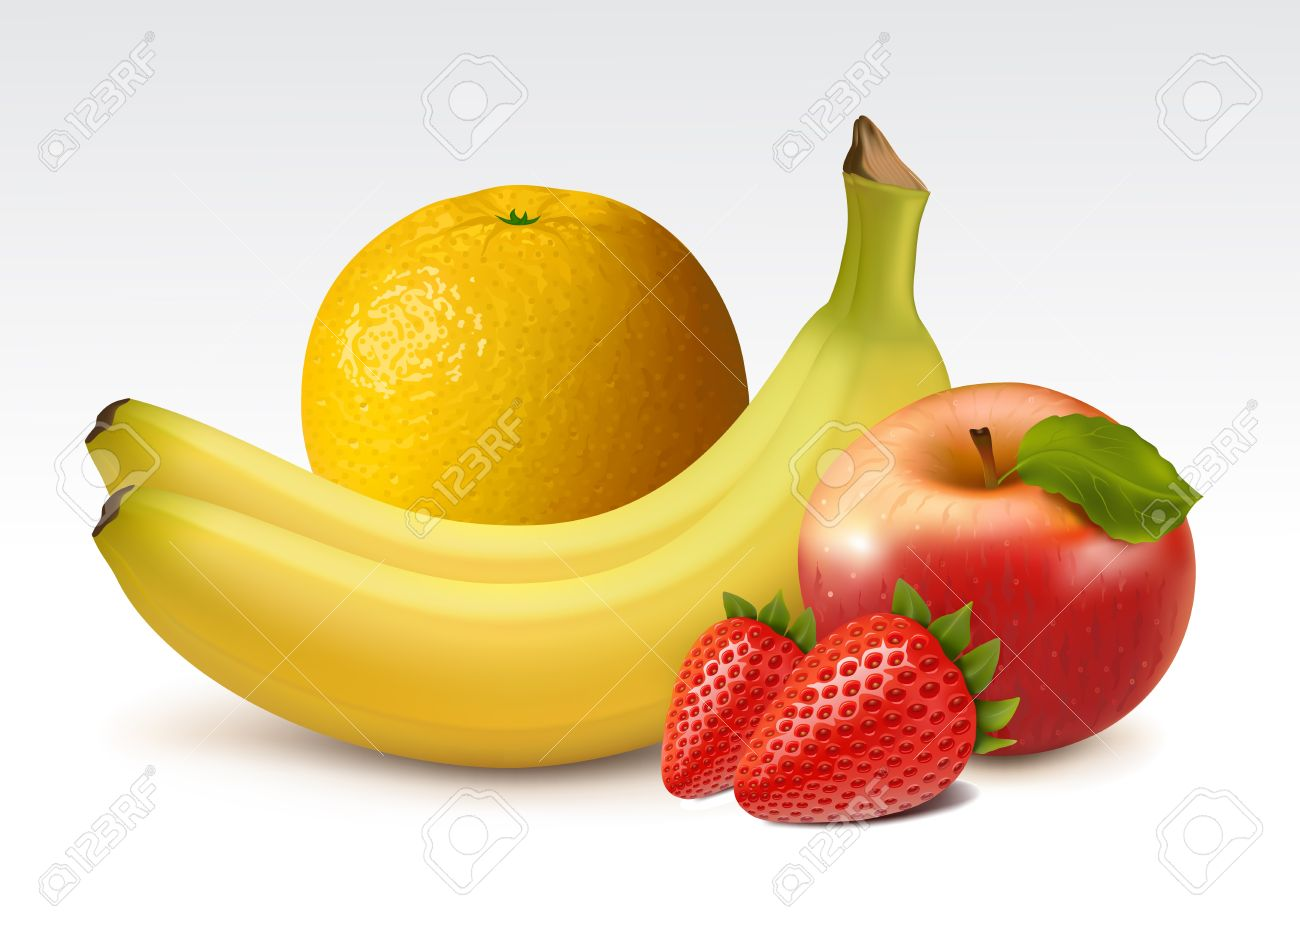 472 Bananas free clipart.